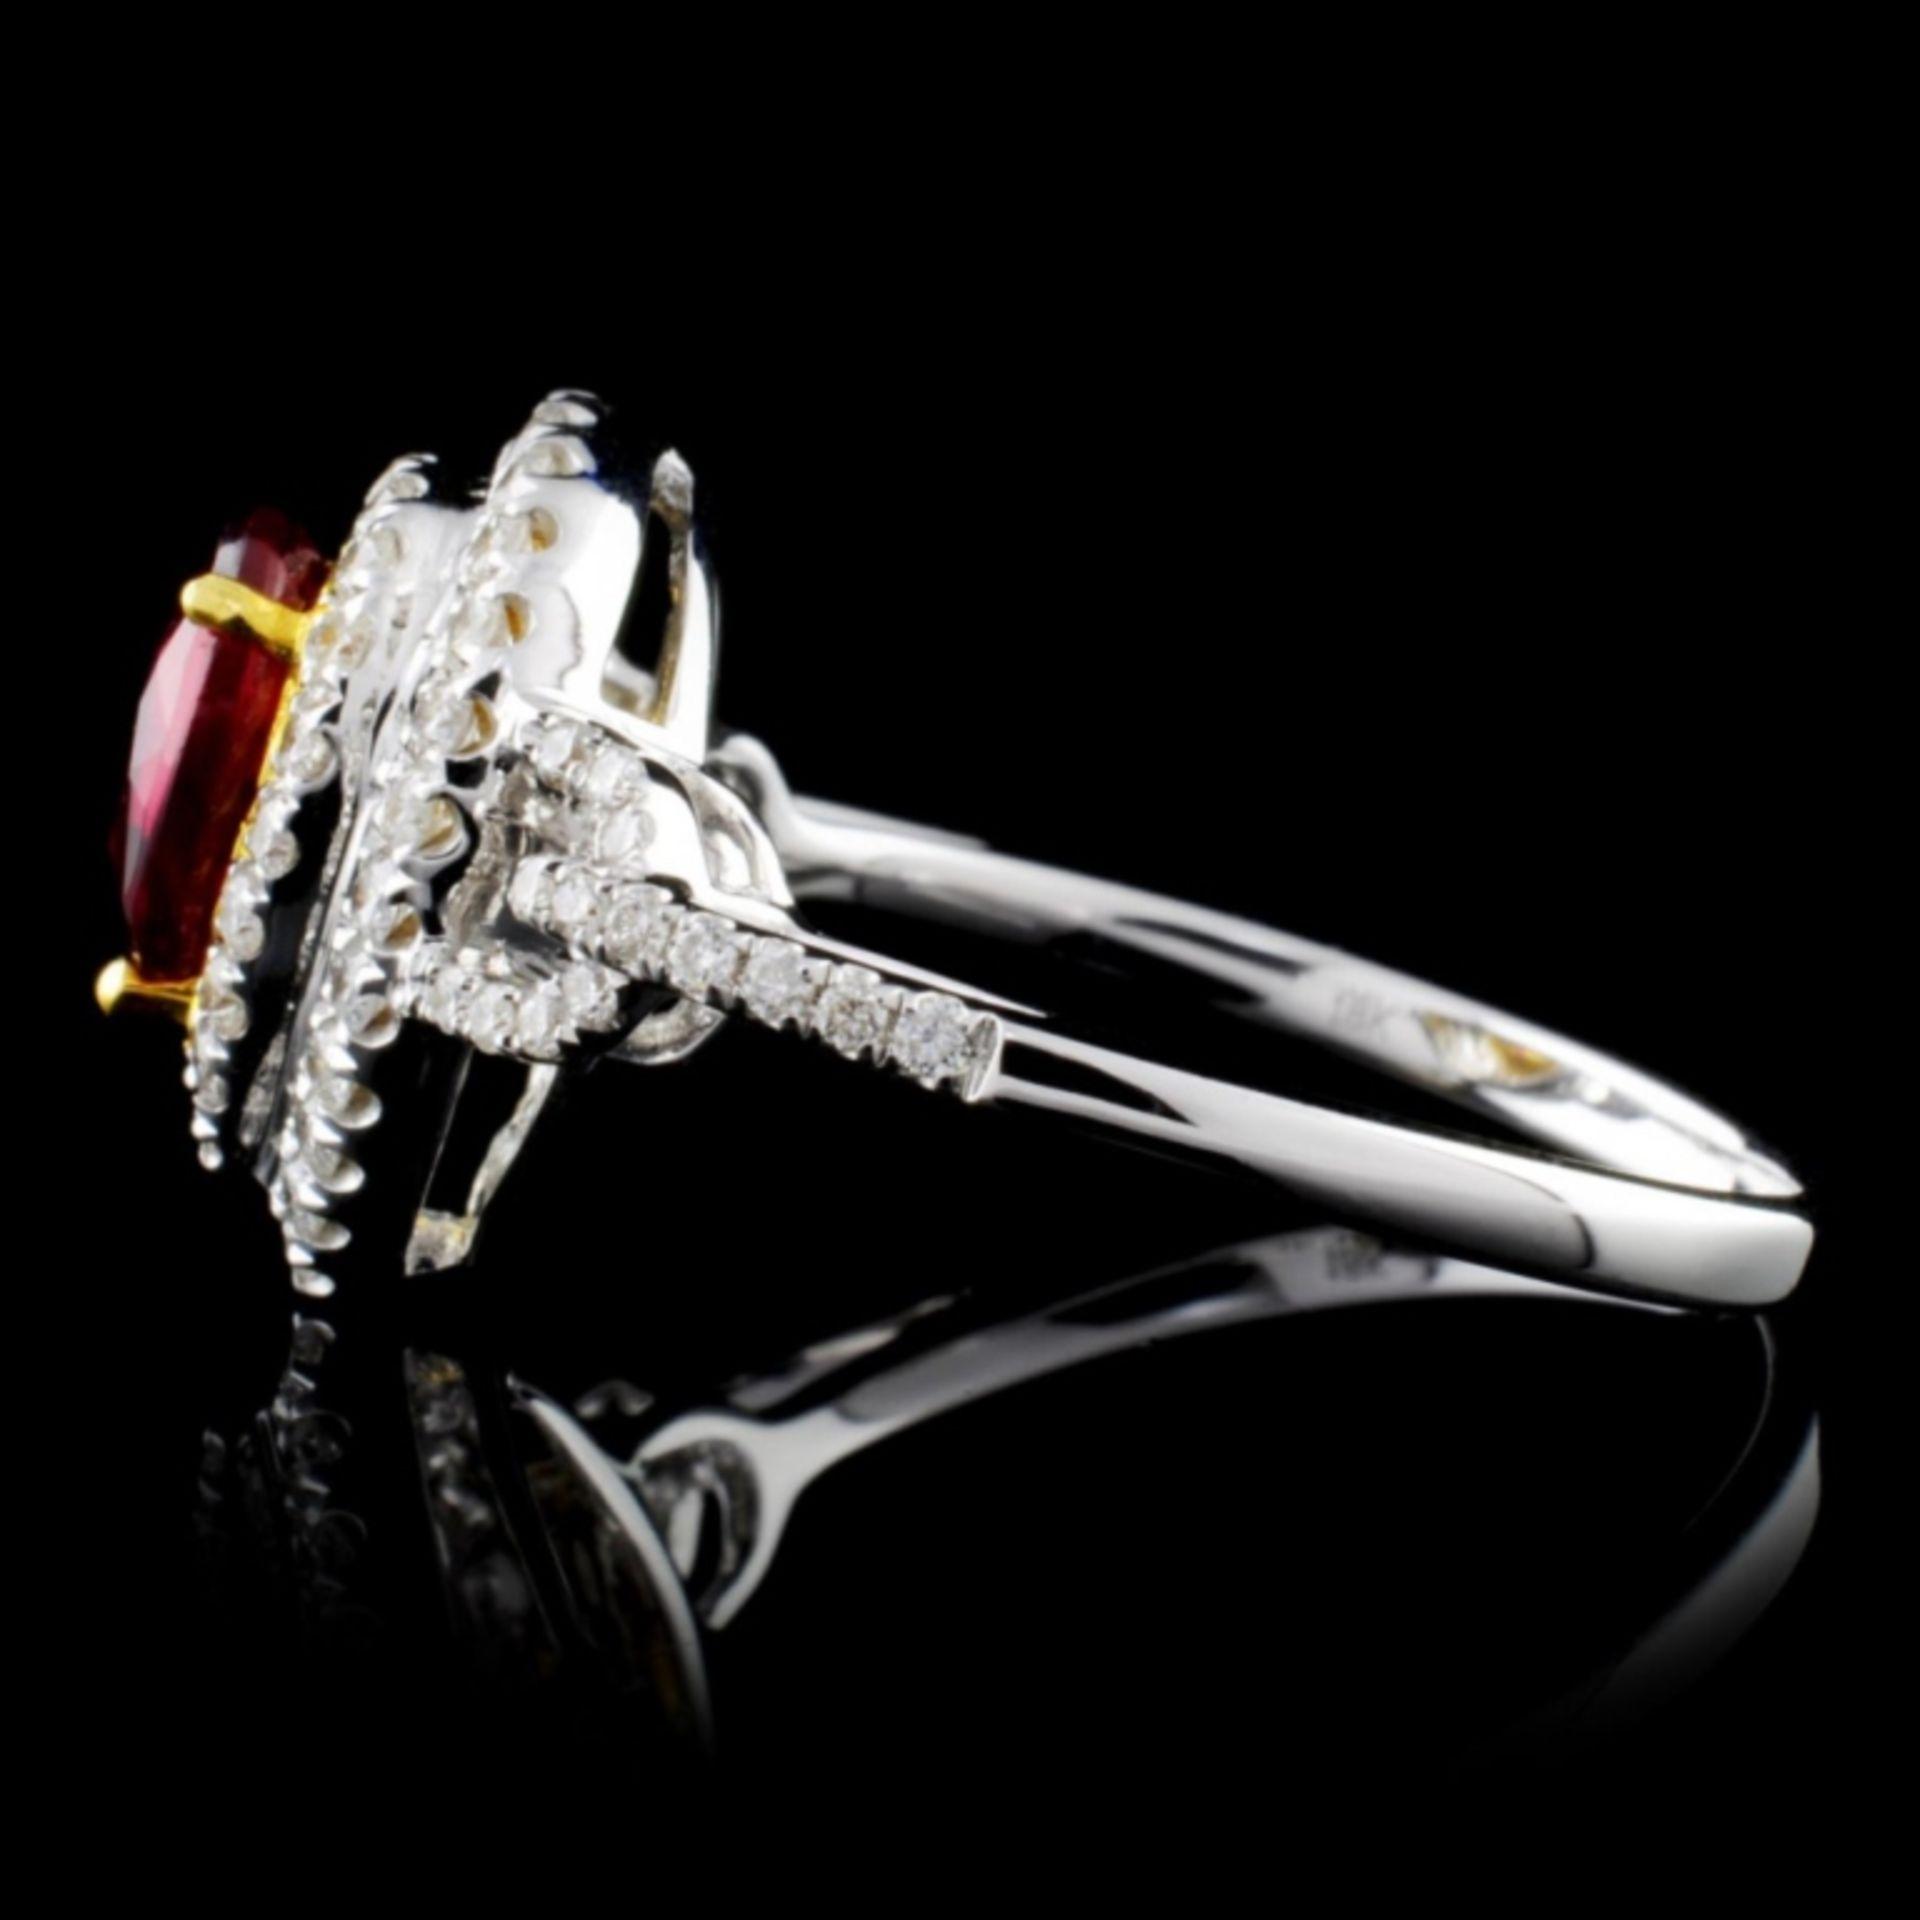 18K White Gold 0.99ct Ruby & 0.45ct Diamond Ring - Image 3 of 4